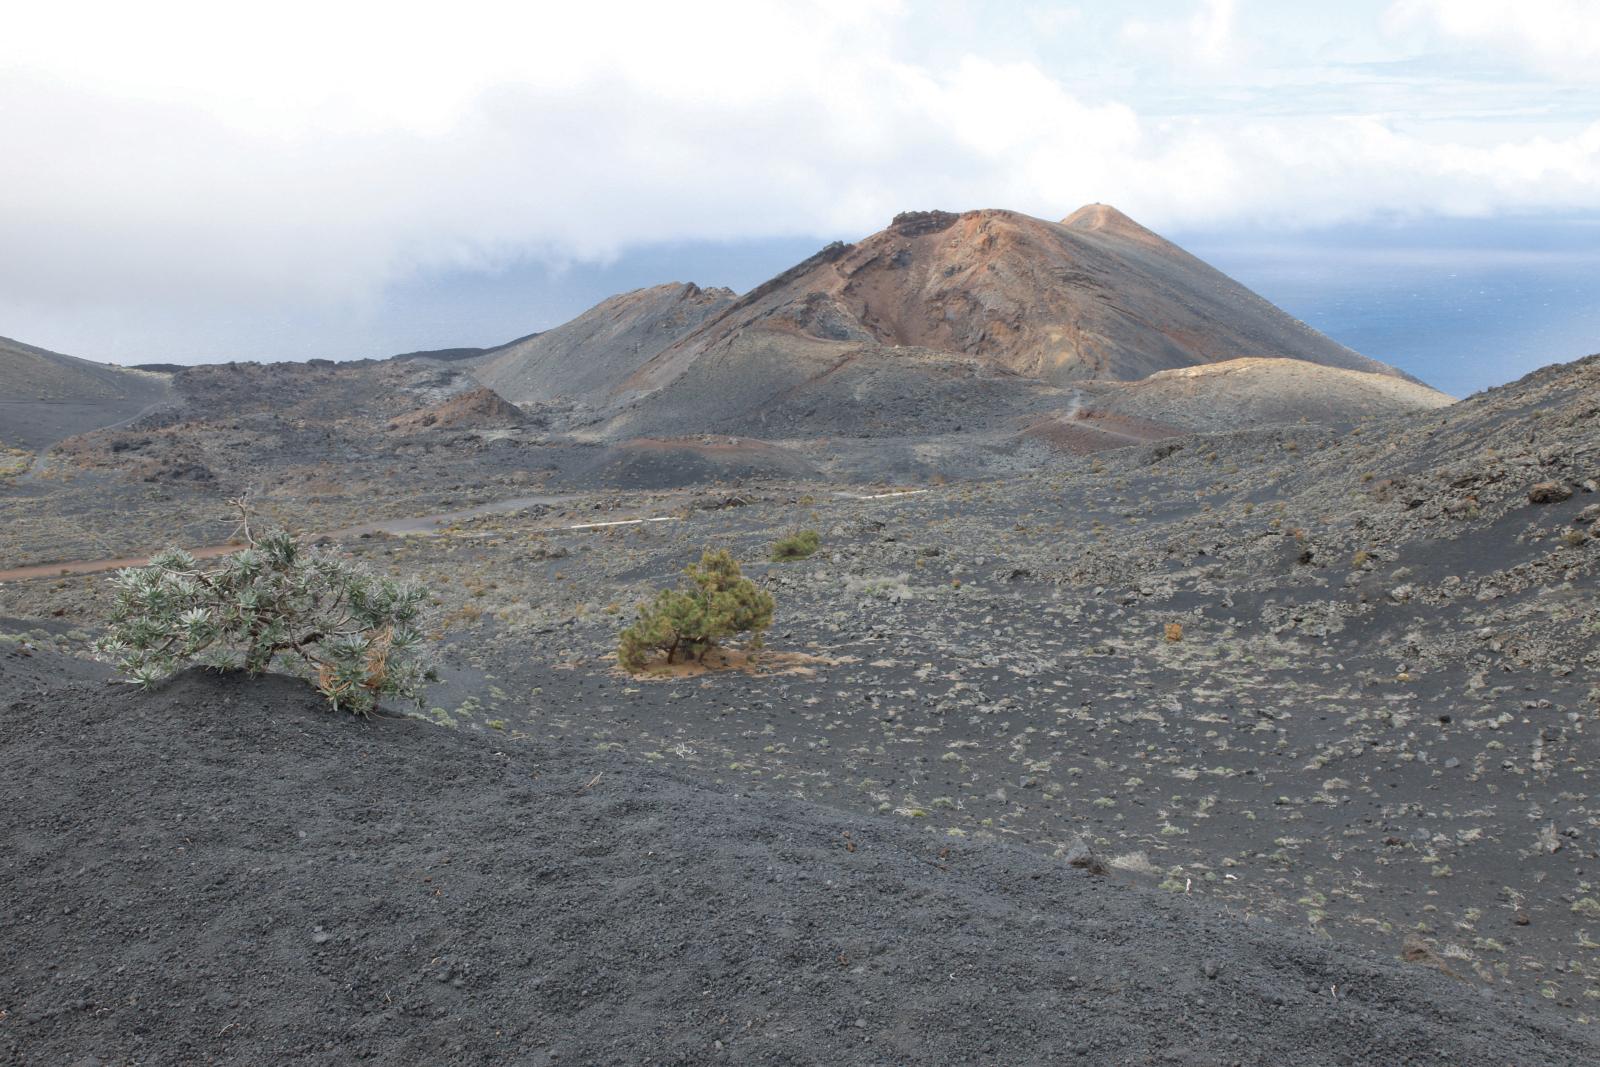 Kanaren_Kanarische Inseln_La Palma_Tenequia_Vulkan_Wanderung